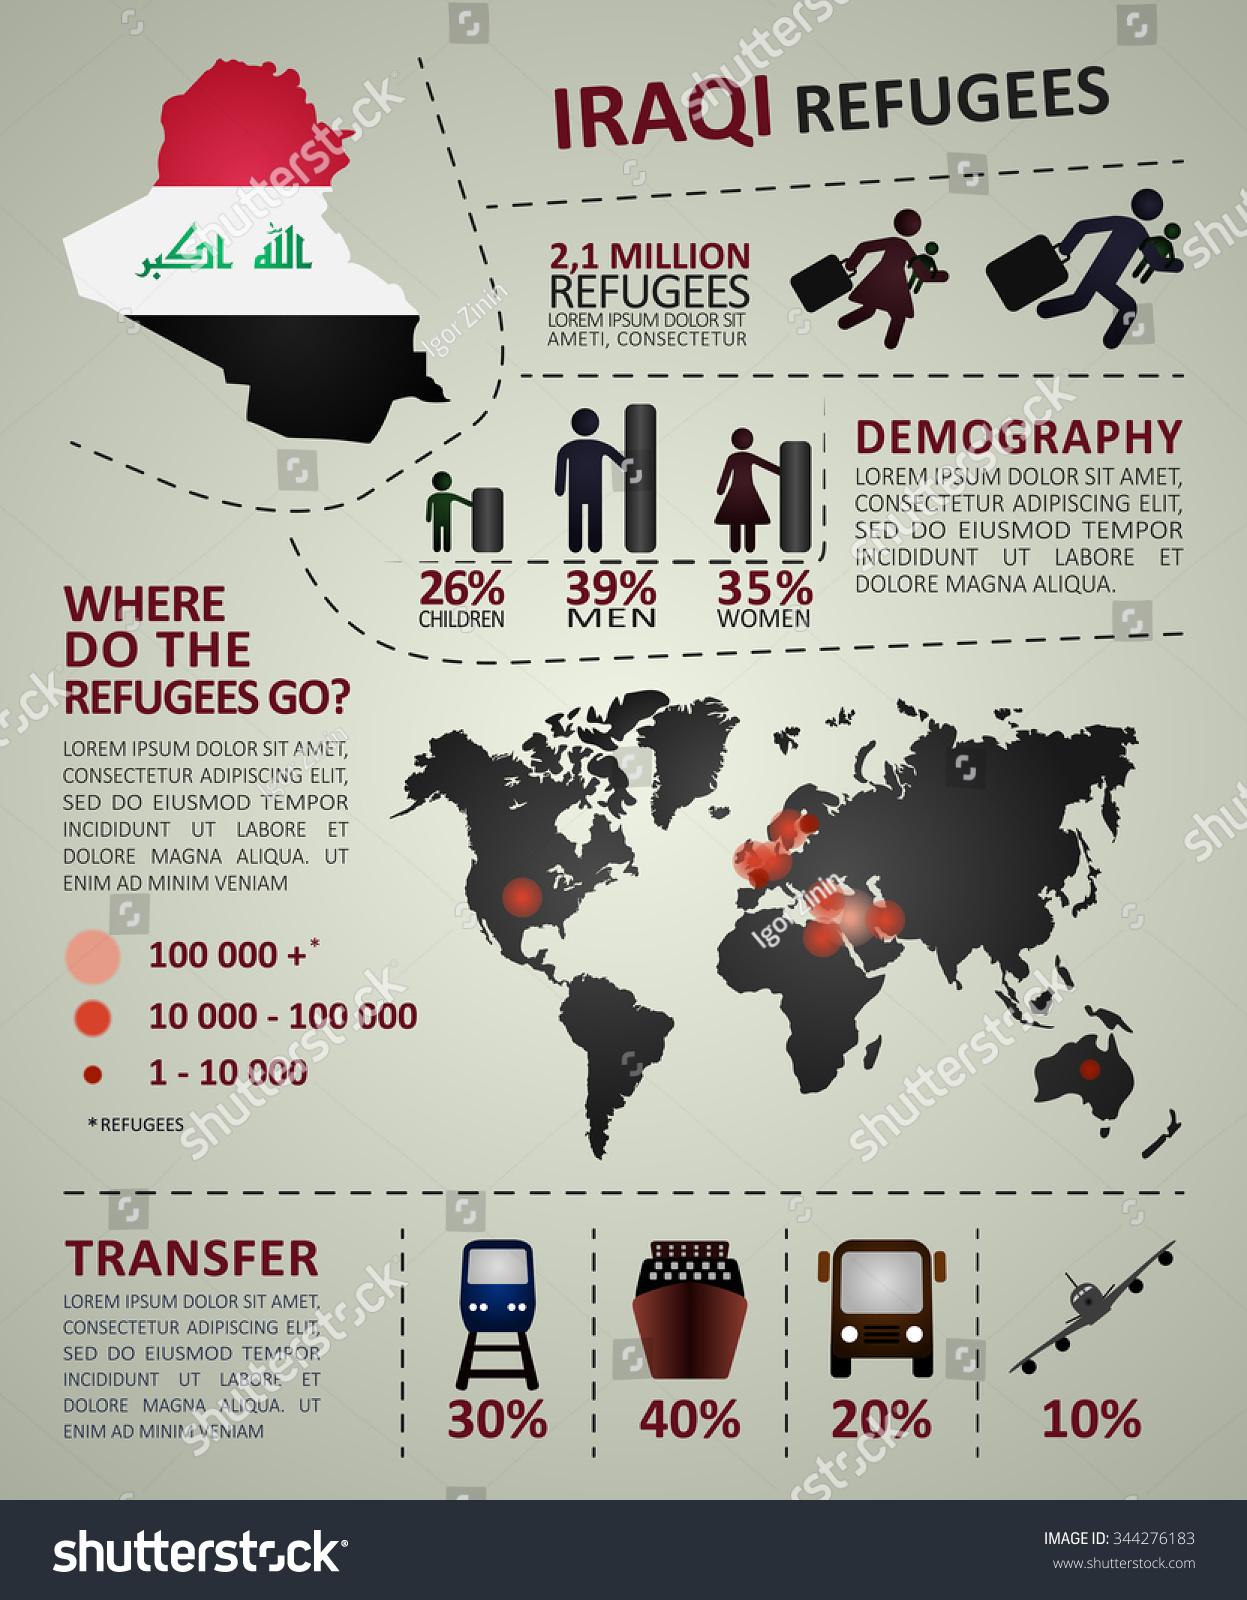 Iraqi refugees infographic illustration includes following vectores iraqi refugees infographic illustration includes the following design elements refugee icons transport icons gumiabroncs Images